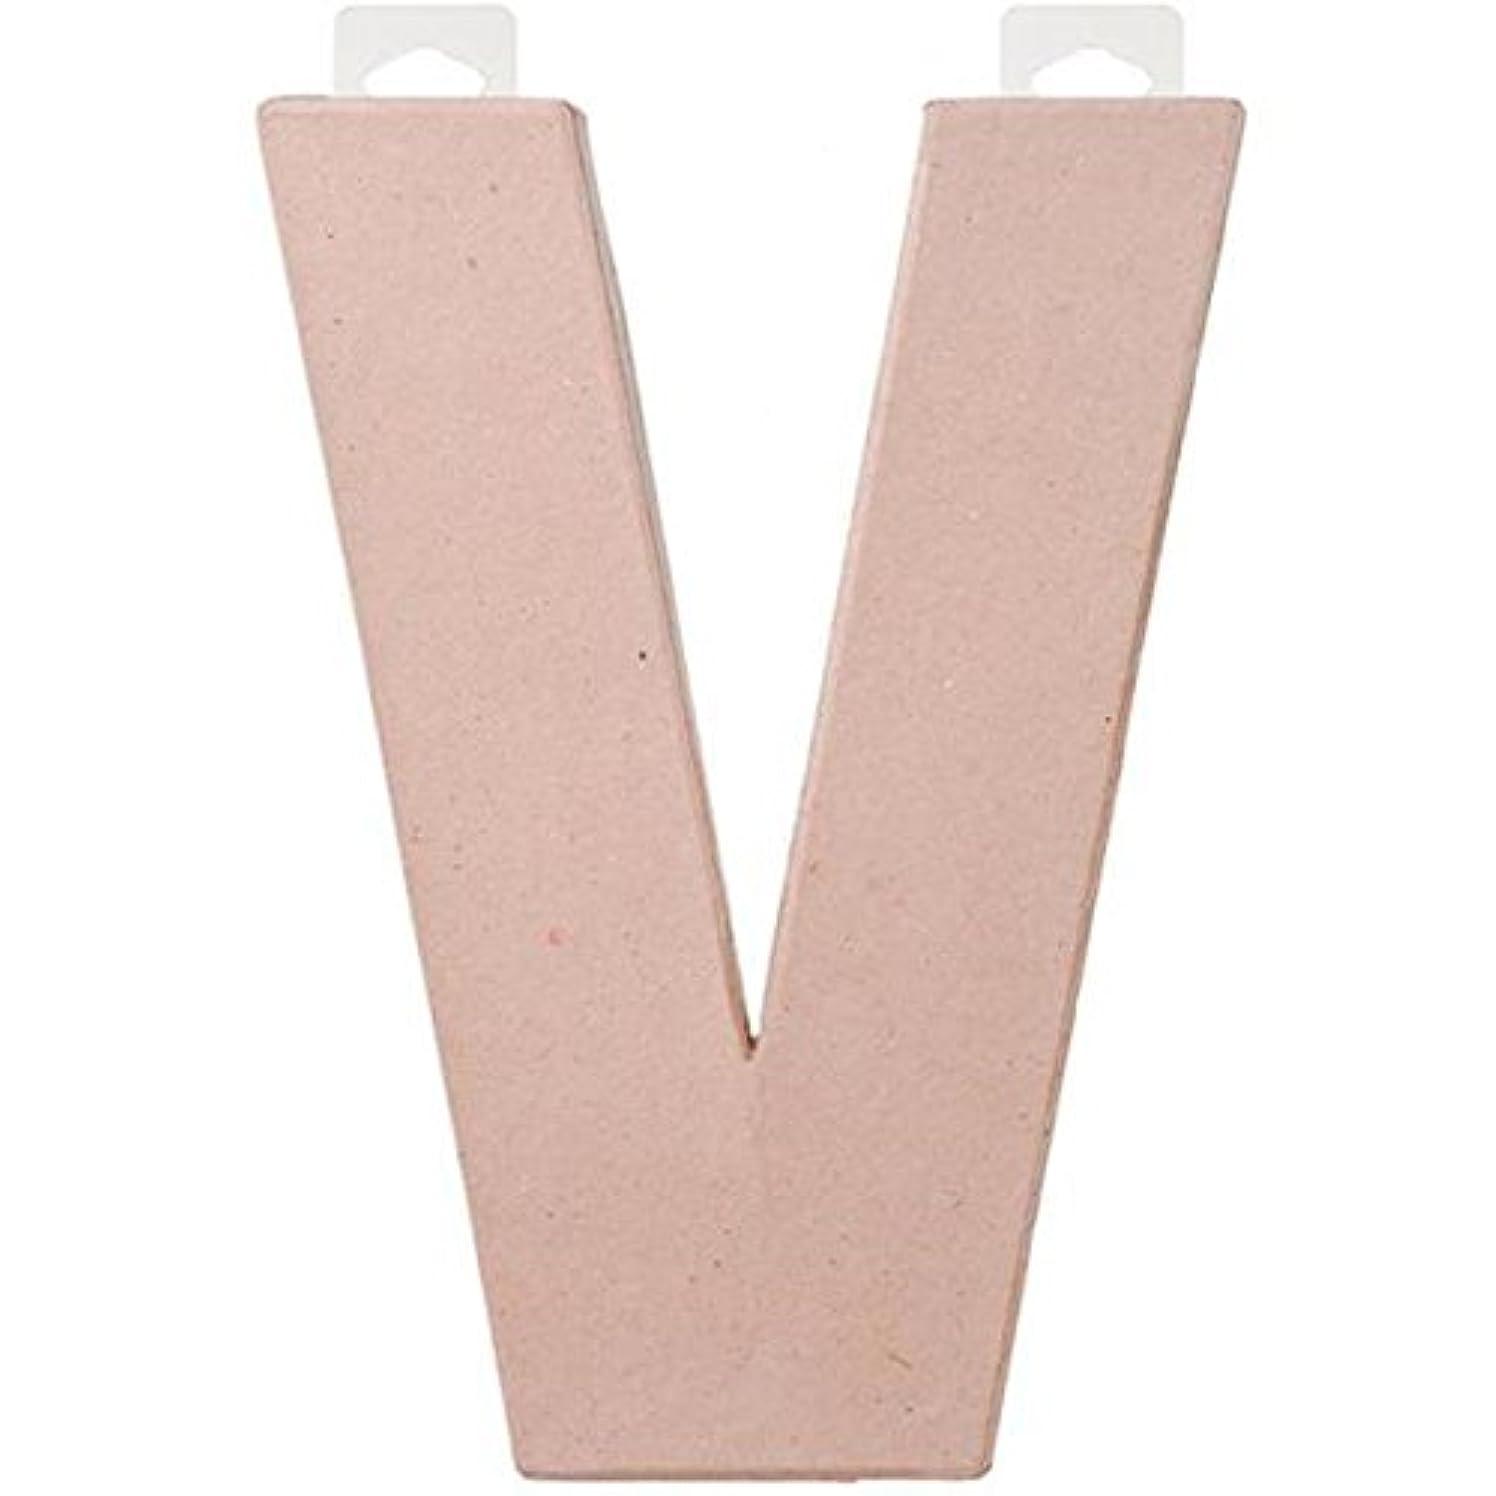 Darice 8 inches Paper Mache Letter - V, 8-Inch